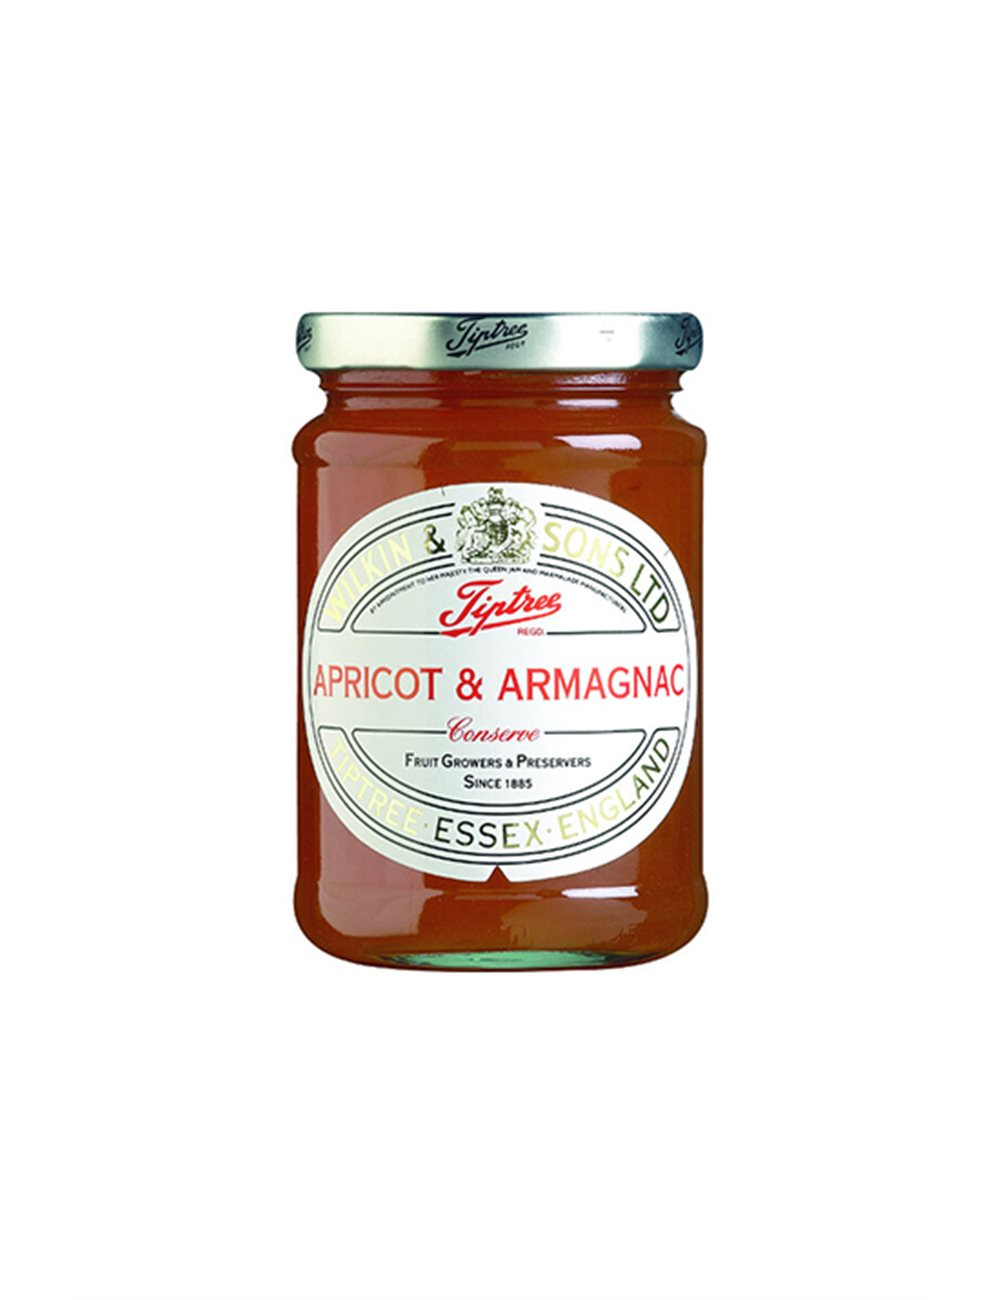 Apricot & Armagnac 340g